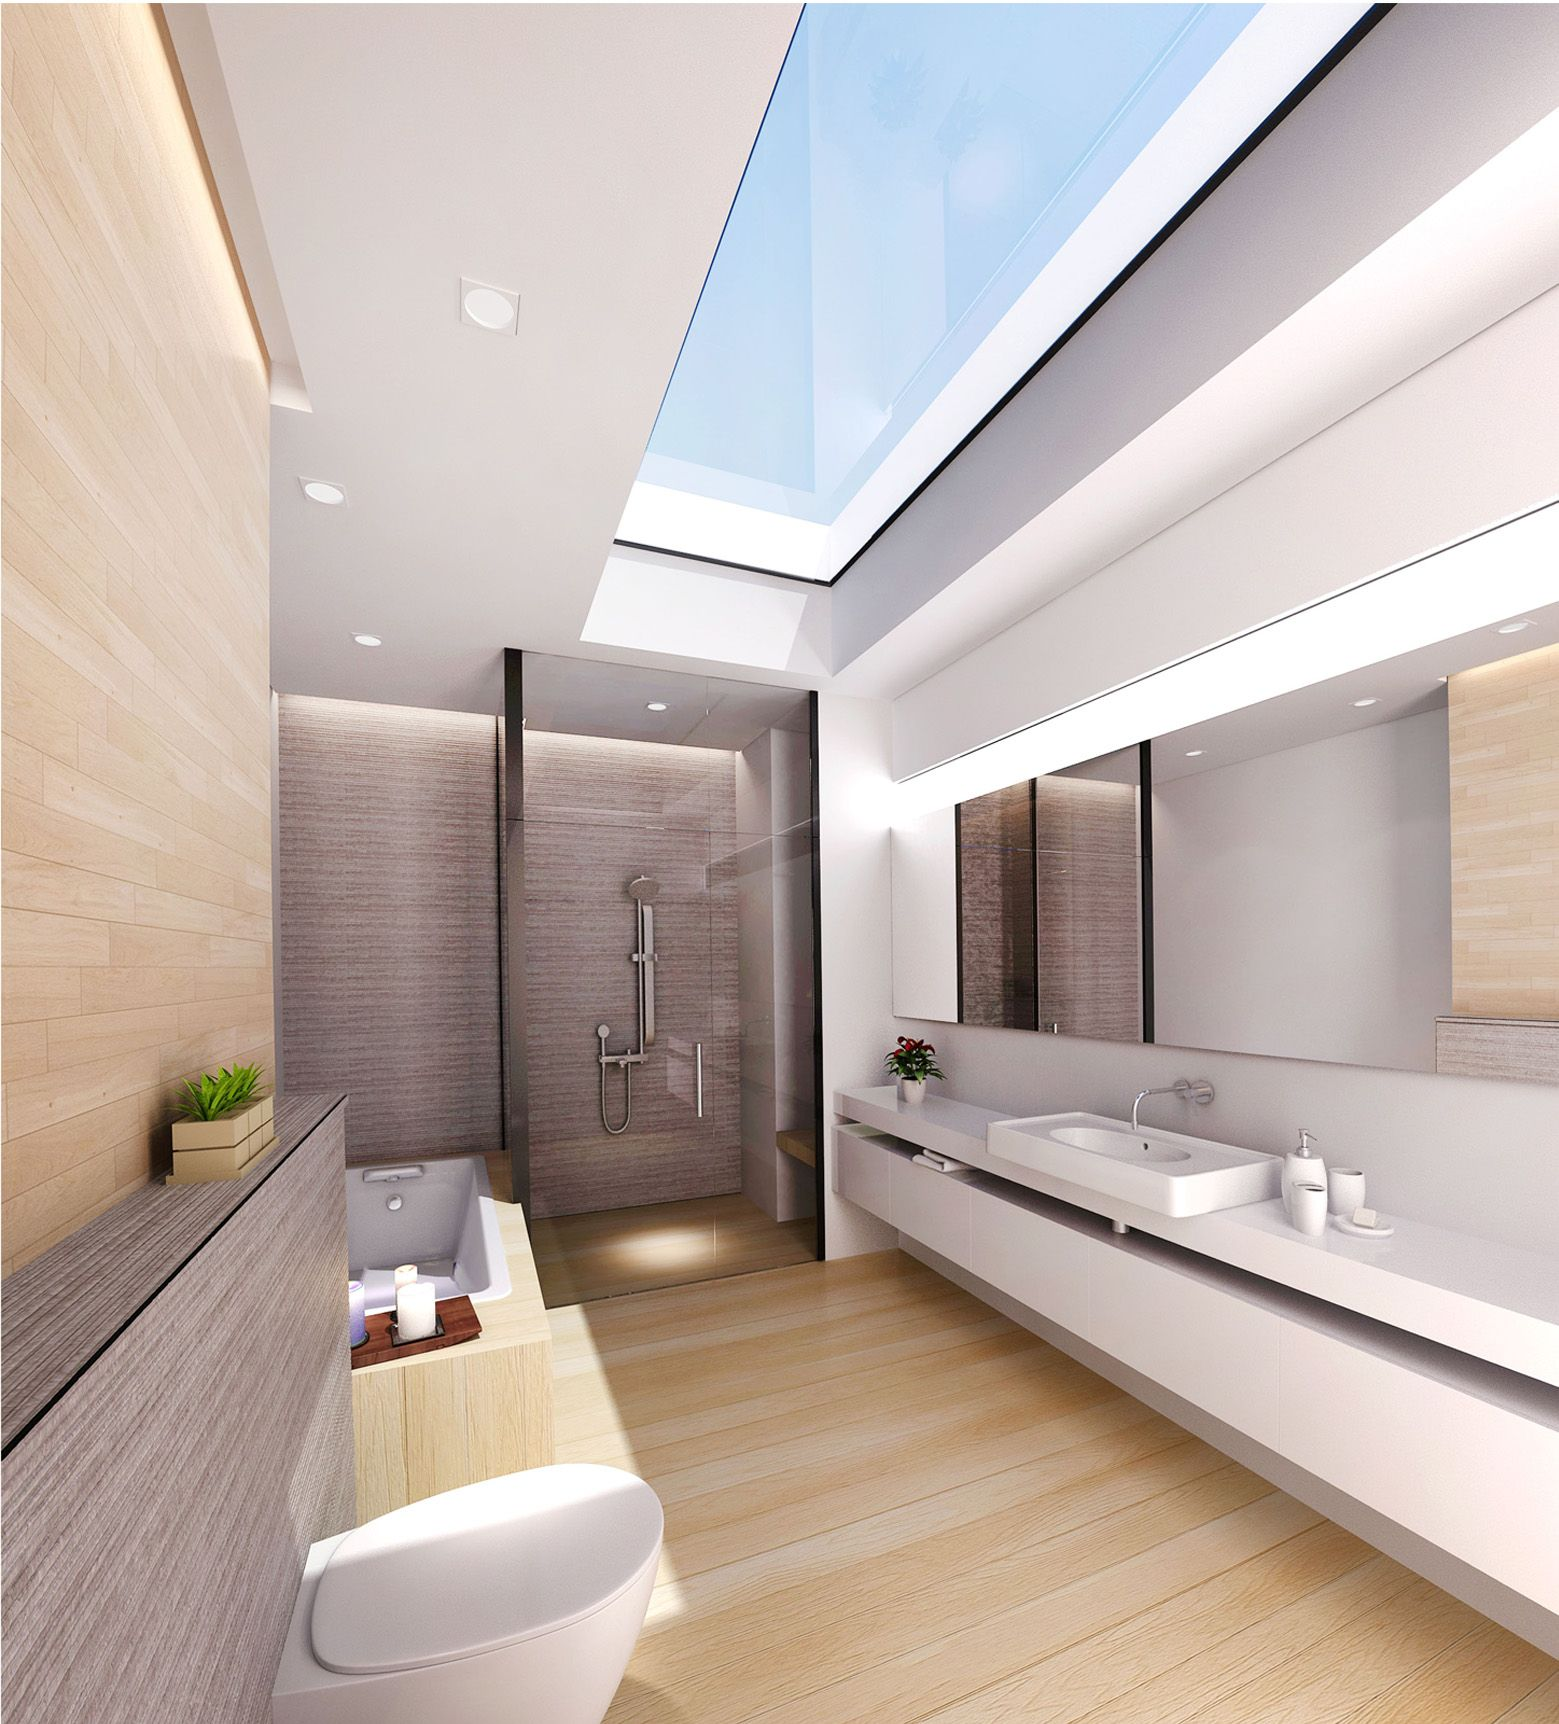 modern sky light bathroom design designed by swiss bureau modern sky light bathroom design designed by swiss bureau interior design llc best interior